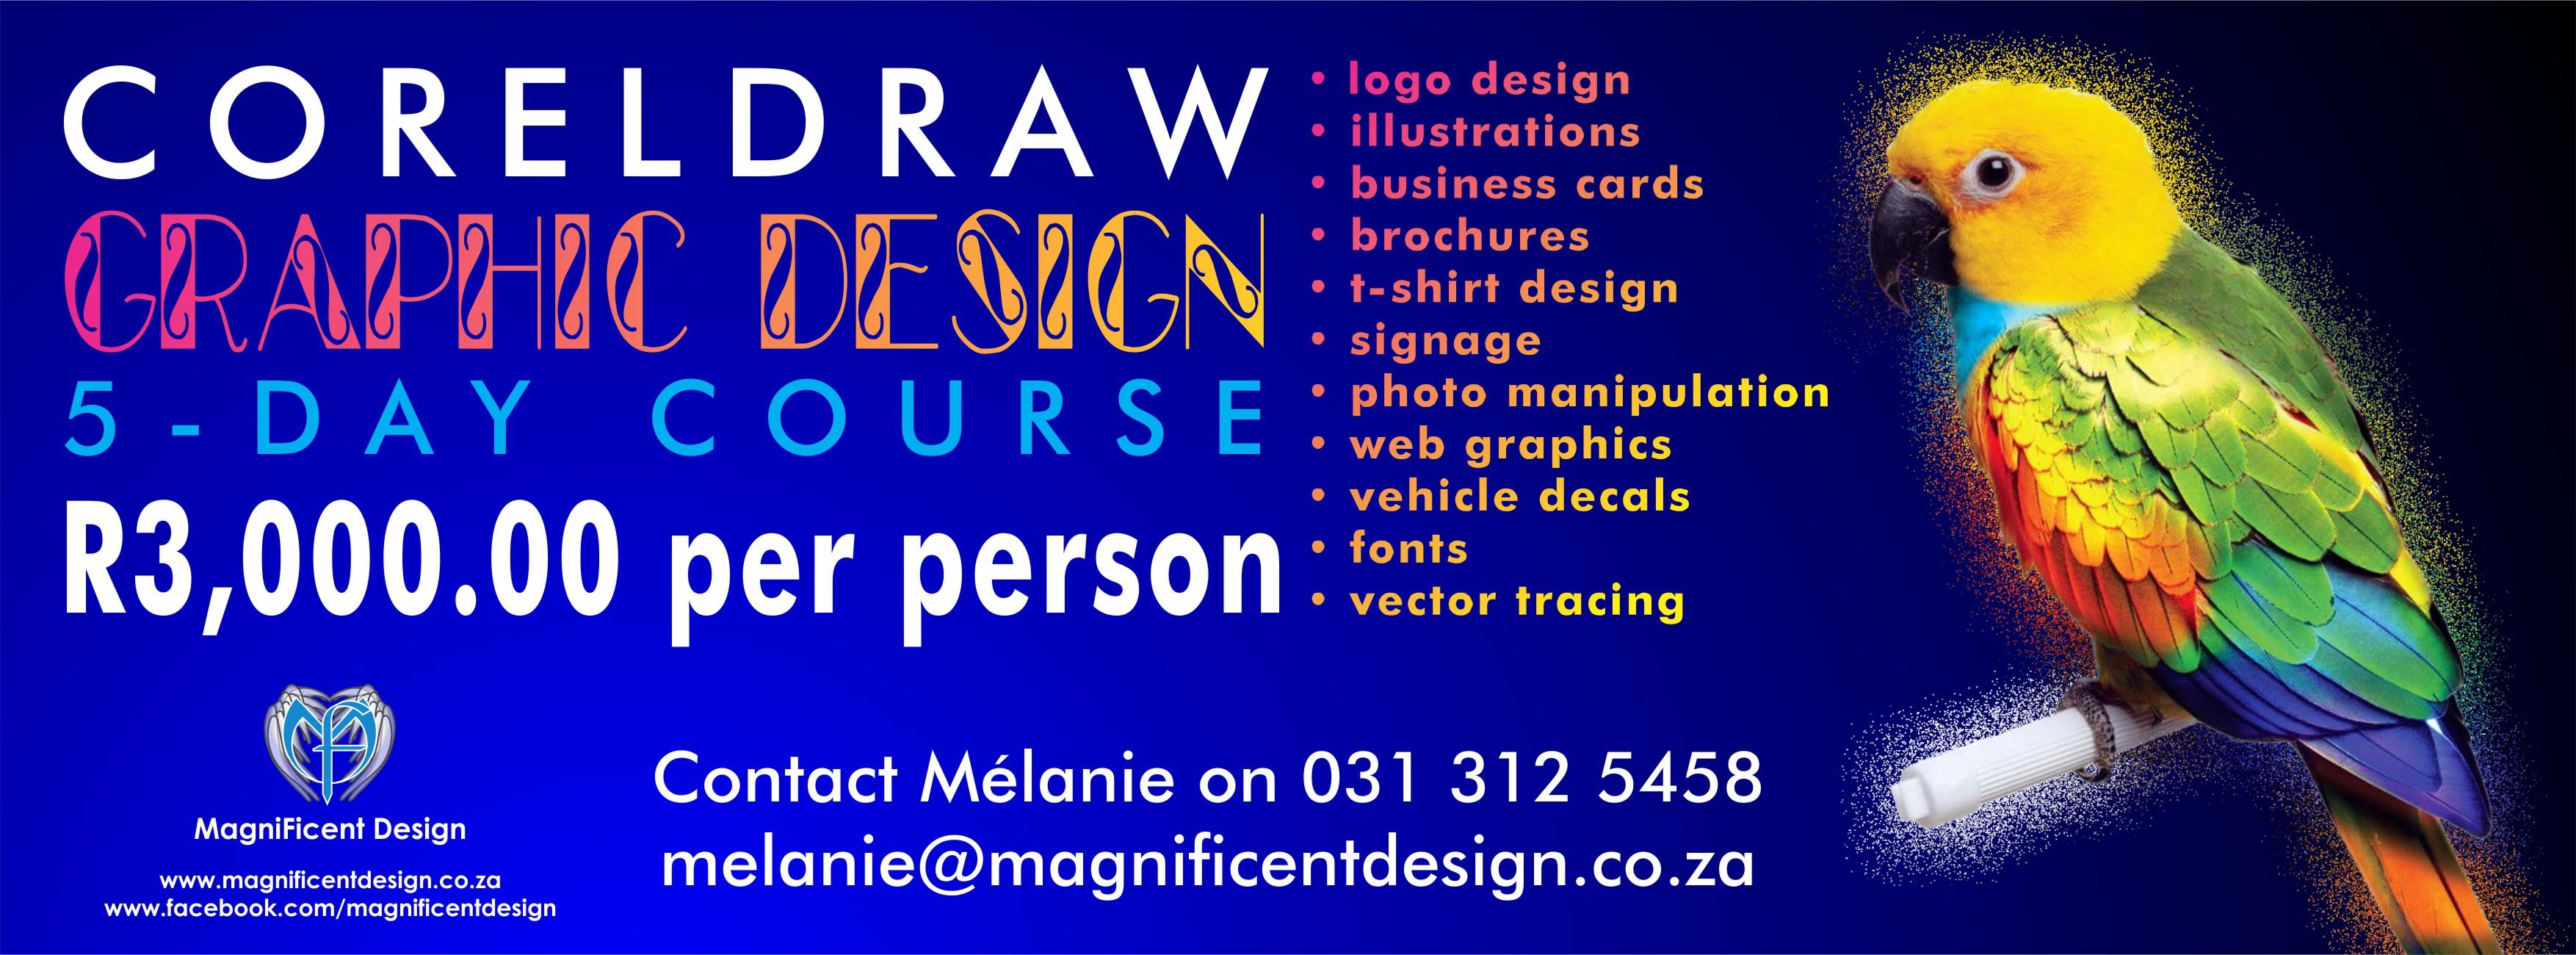 T shirt design using coreldraw - Bird Magnificent Design Banner 1 031 312 548